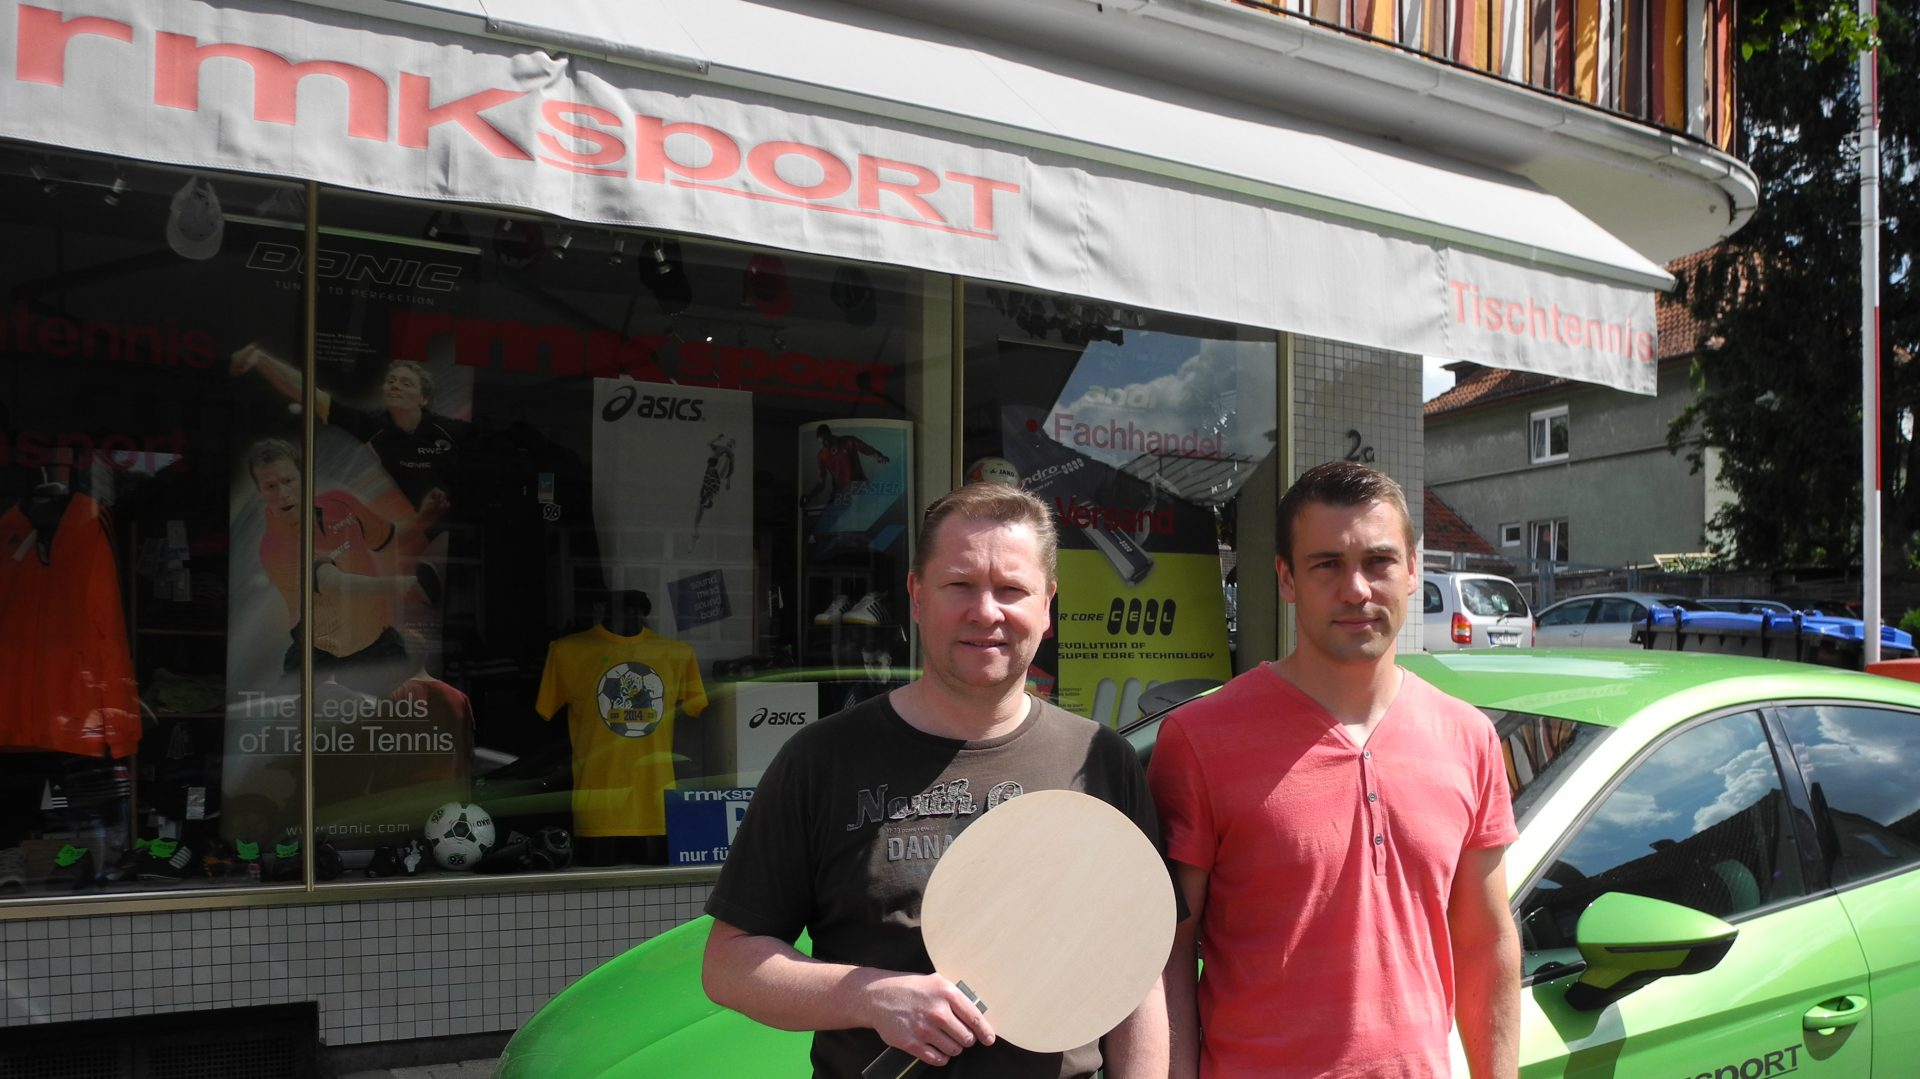 rmk-sport Krenzek & Langanke GbR